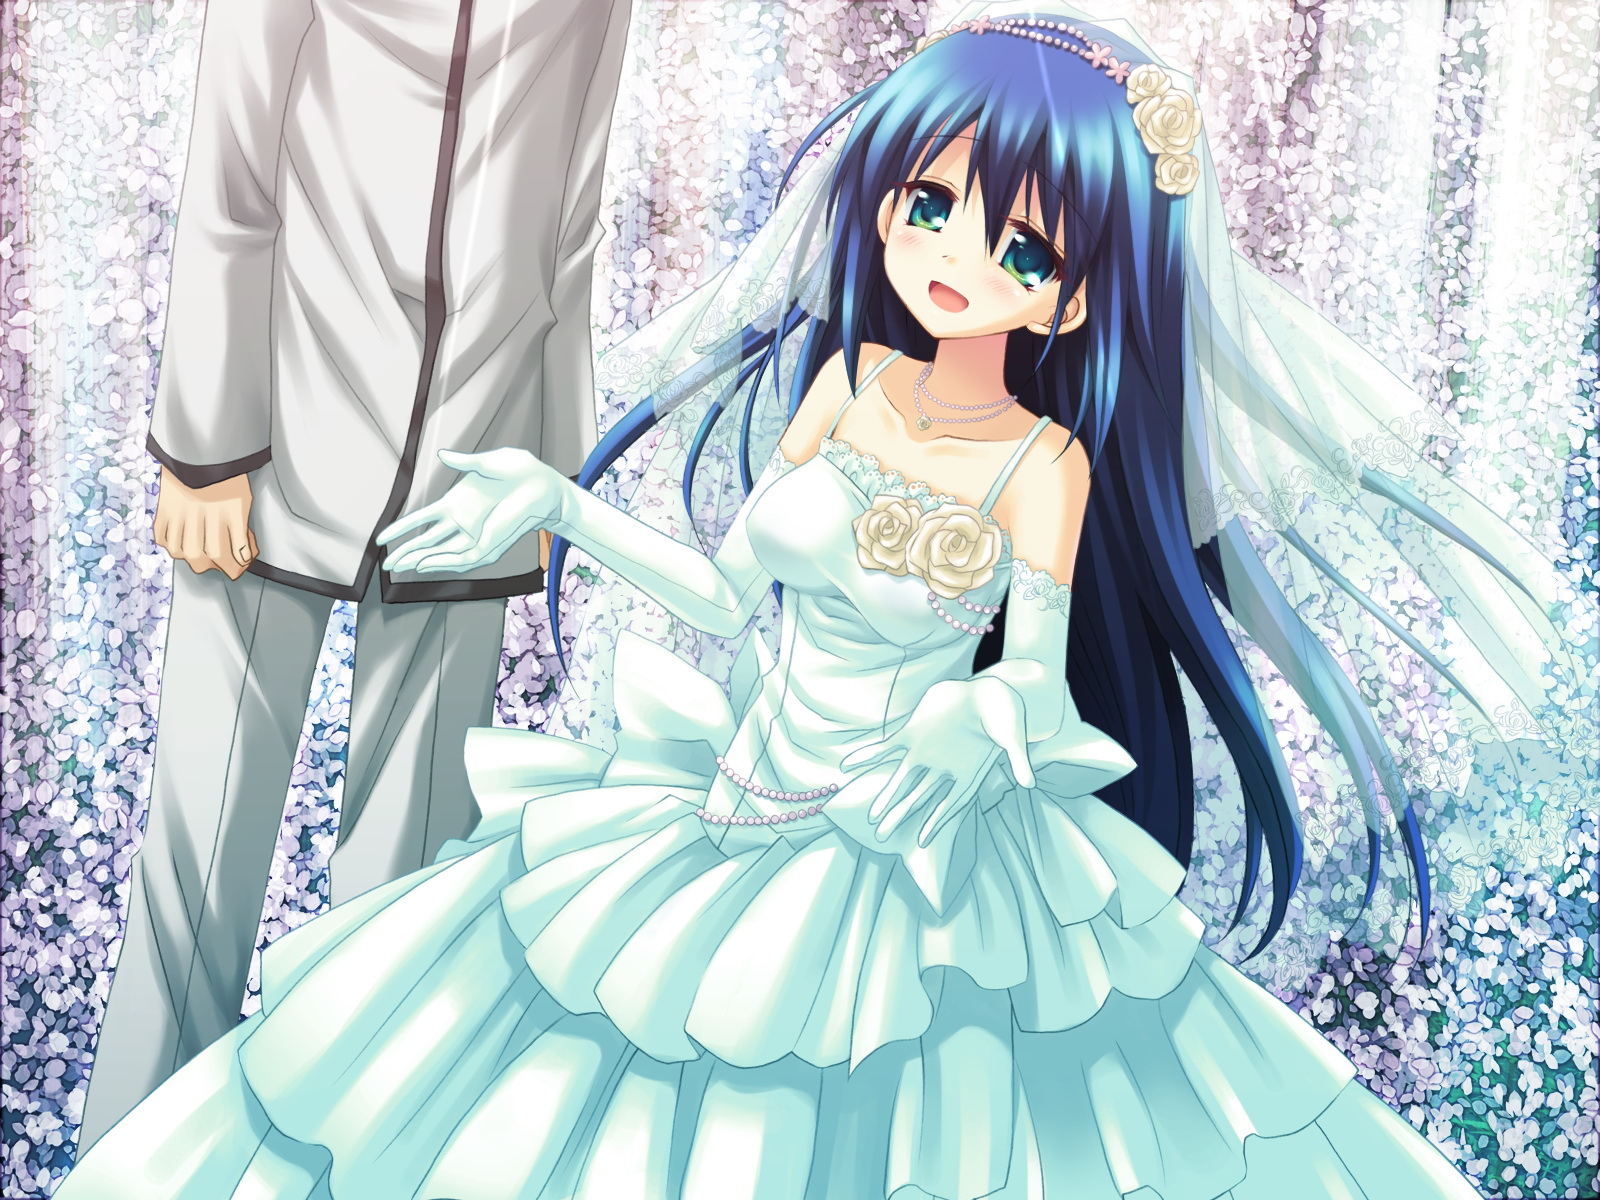 Wedding, Wedding Dress | page 39 - Zerochan Anime Image Board